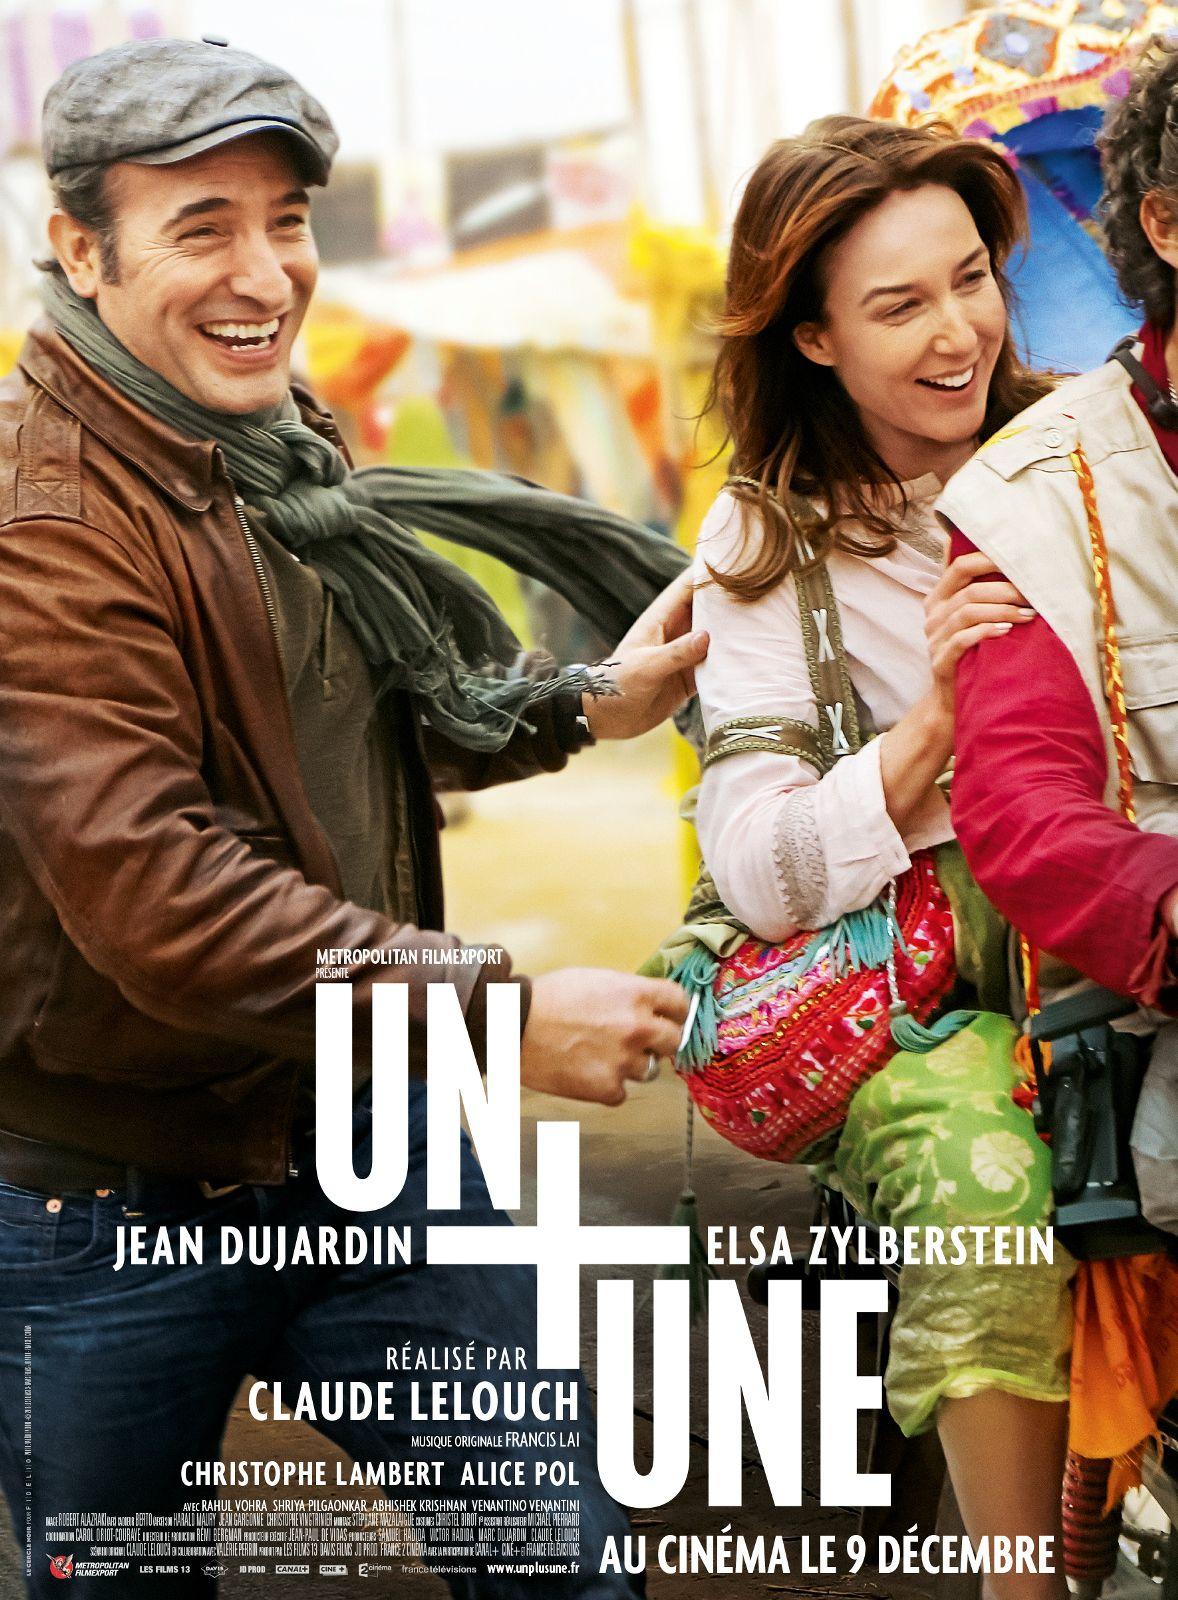 Un   une - Film (2015)